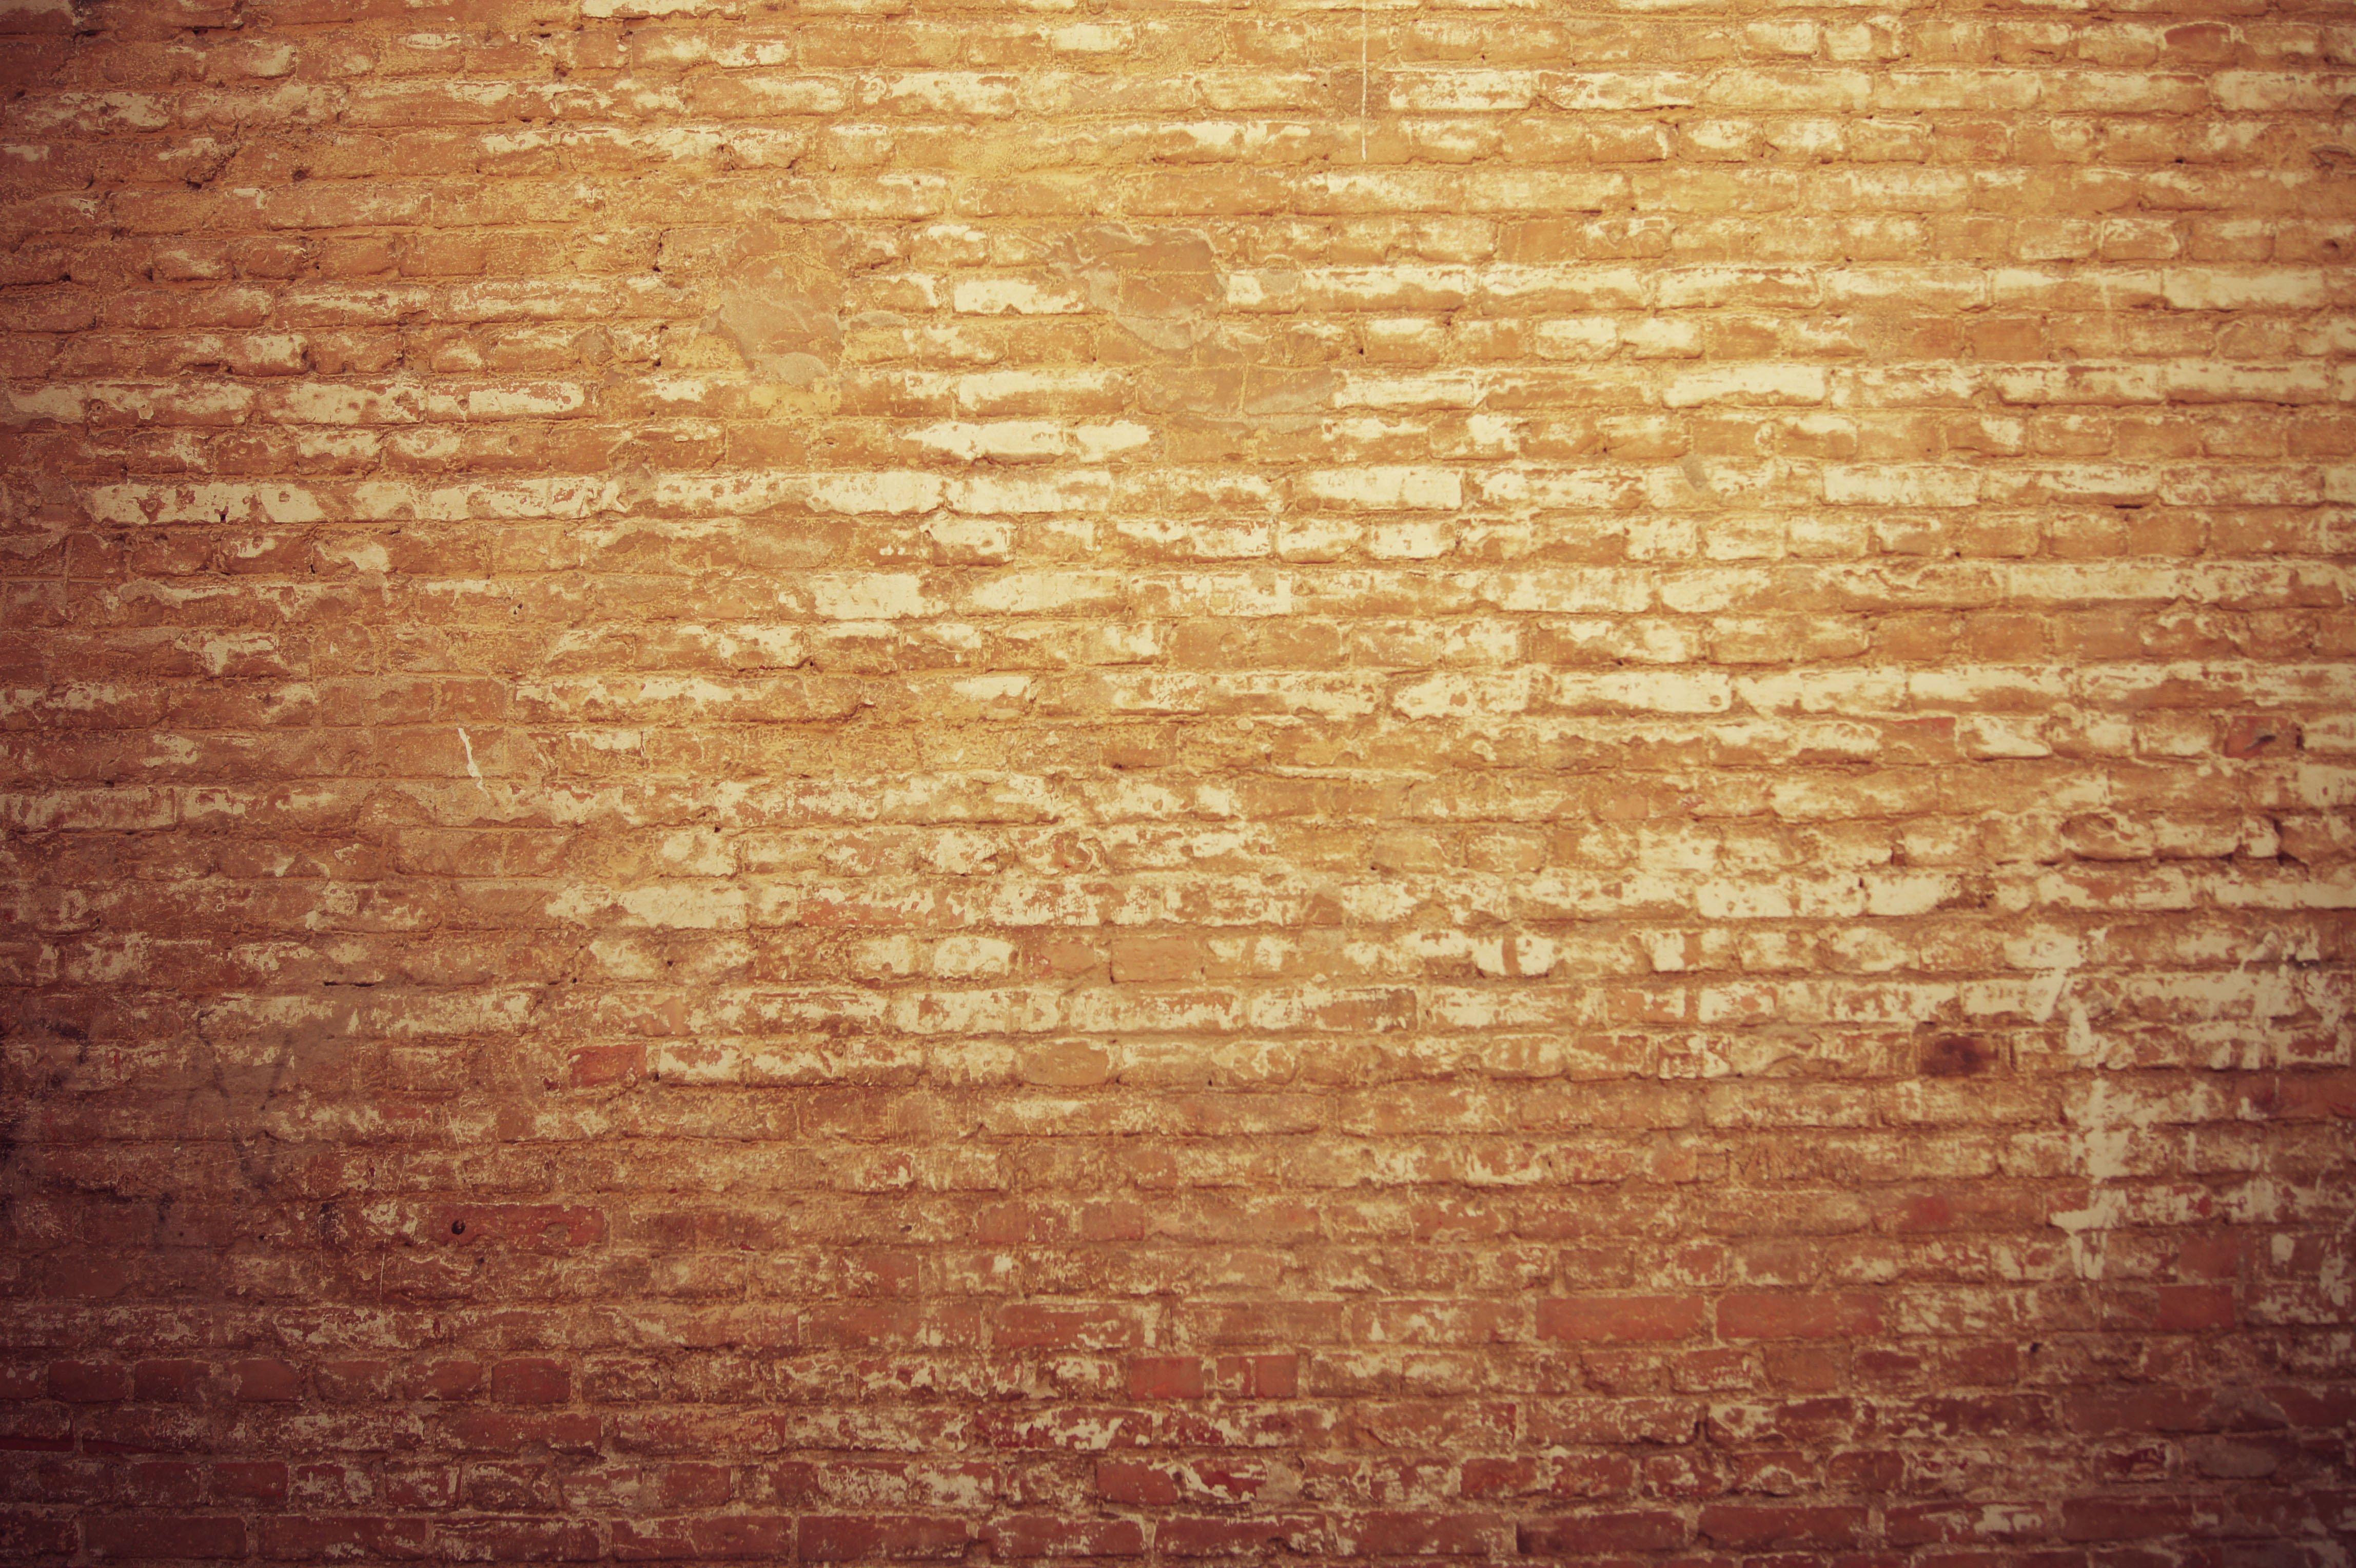 Fondos de pantalla Textura pared de ladrillos